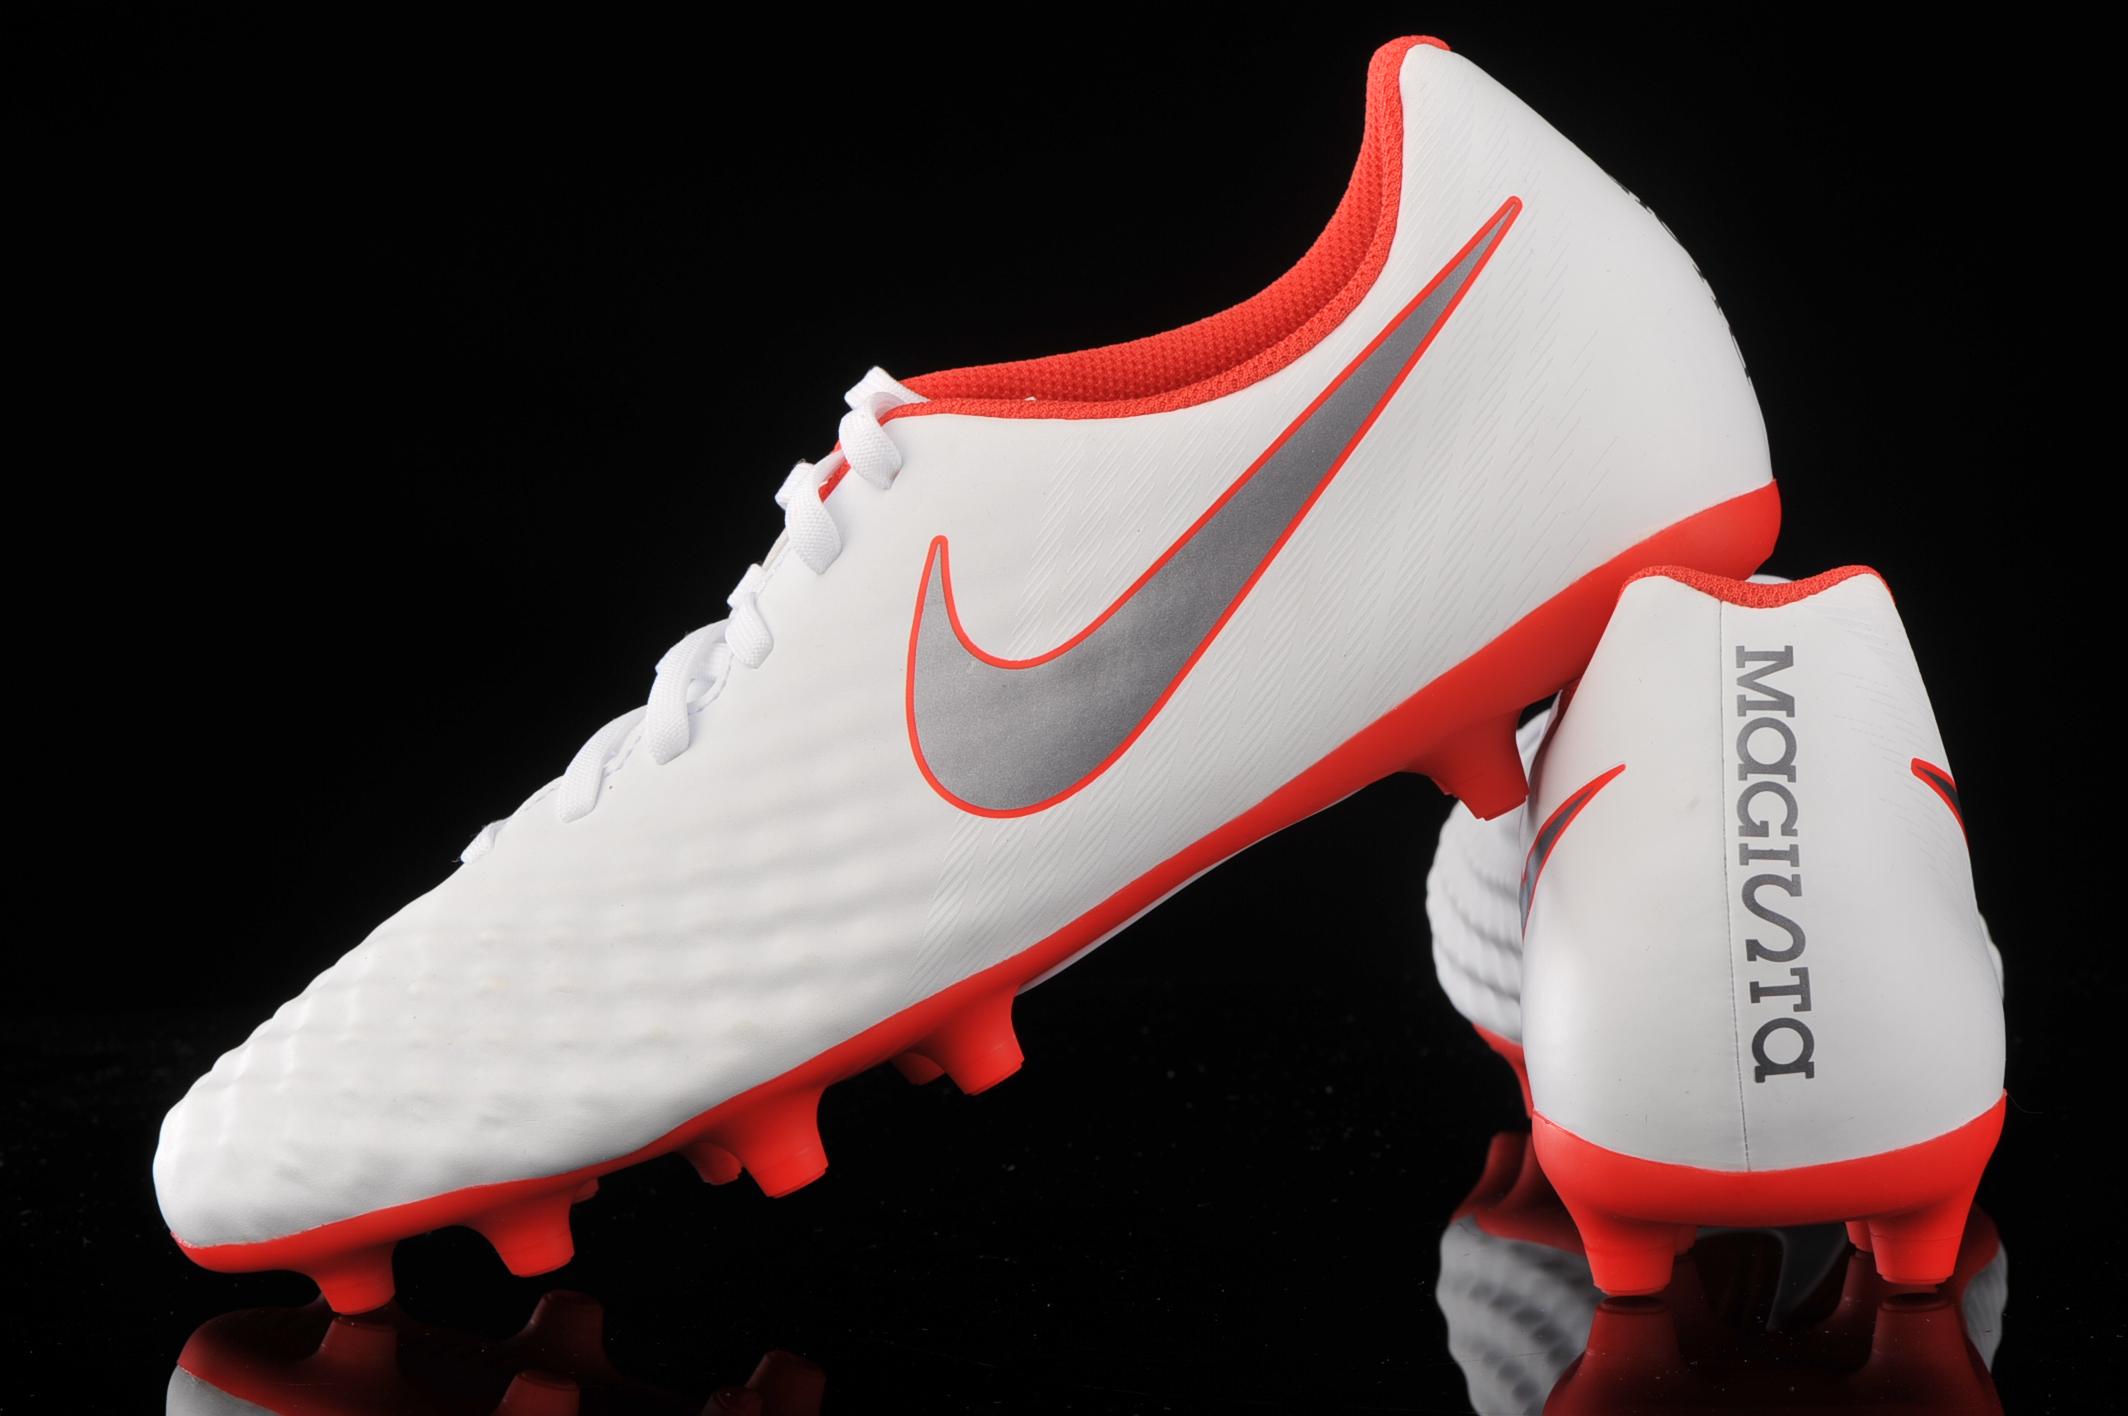 attrezzo sezione Osservazione  Nike Magista Obra 2 Club FG AH7302-107 | R-GOL.com - Football boots &  equipment